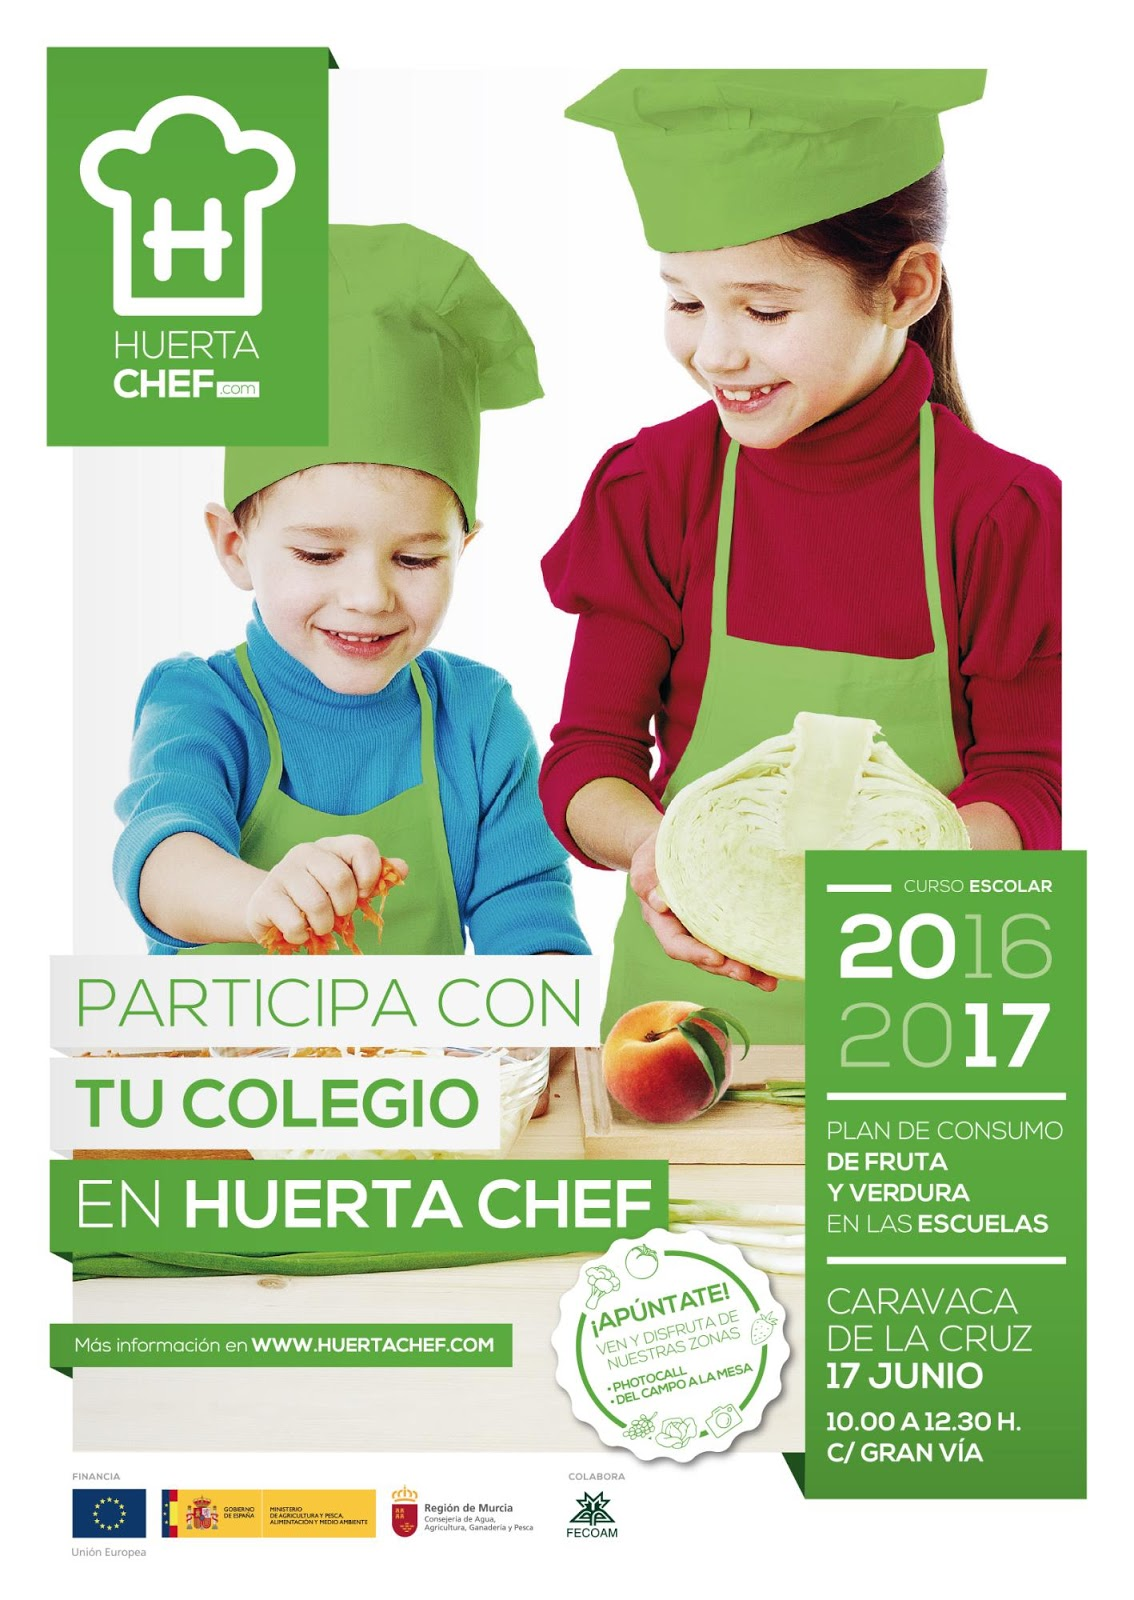 Resultado de imagen de huerta chef murcia 2017